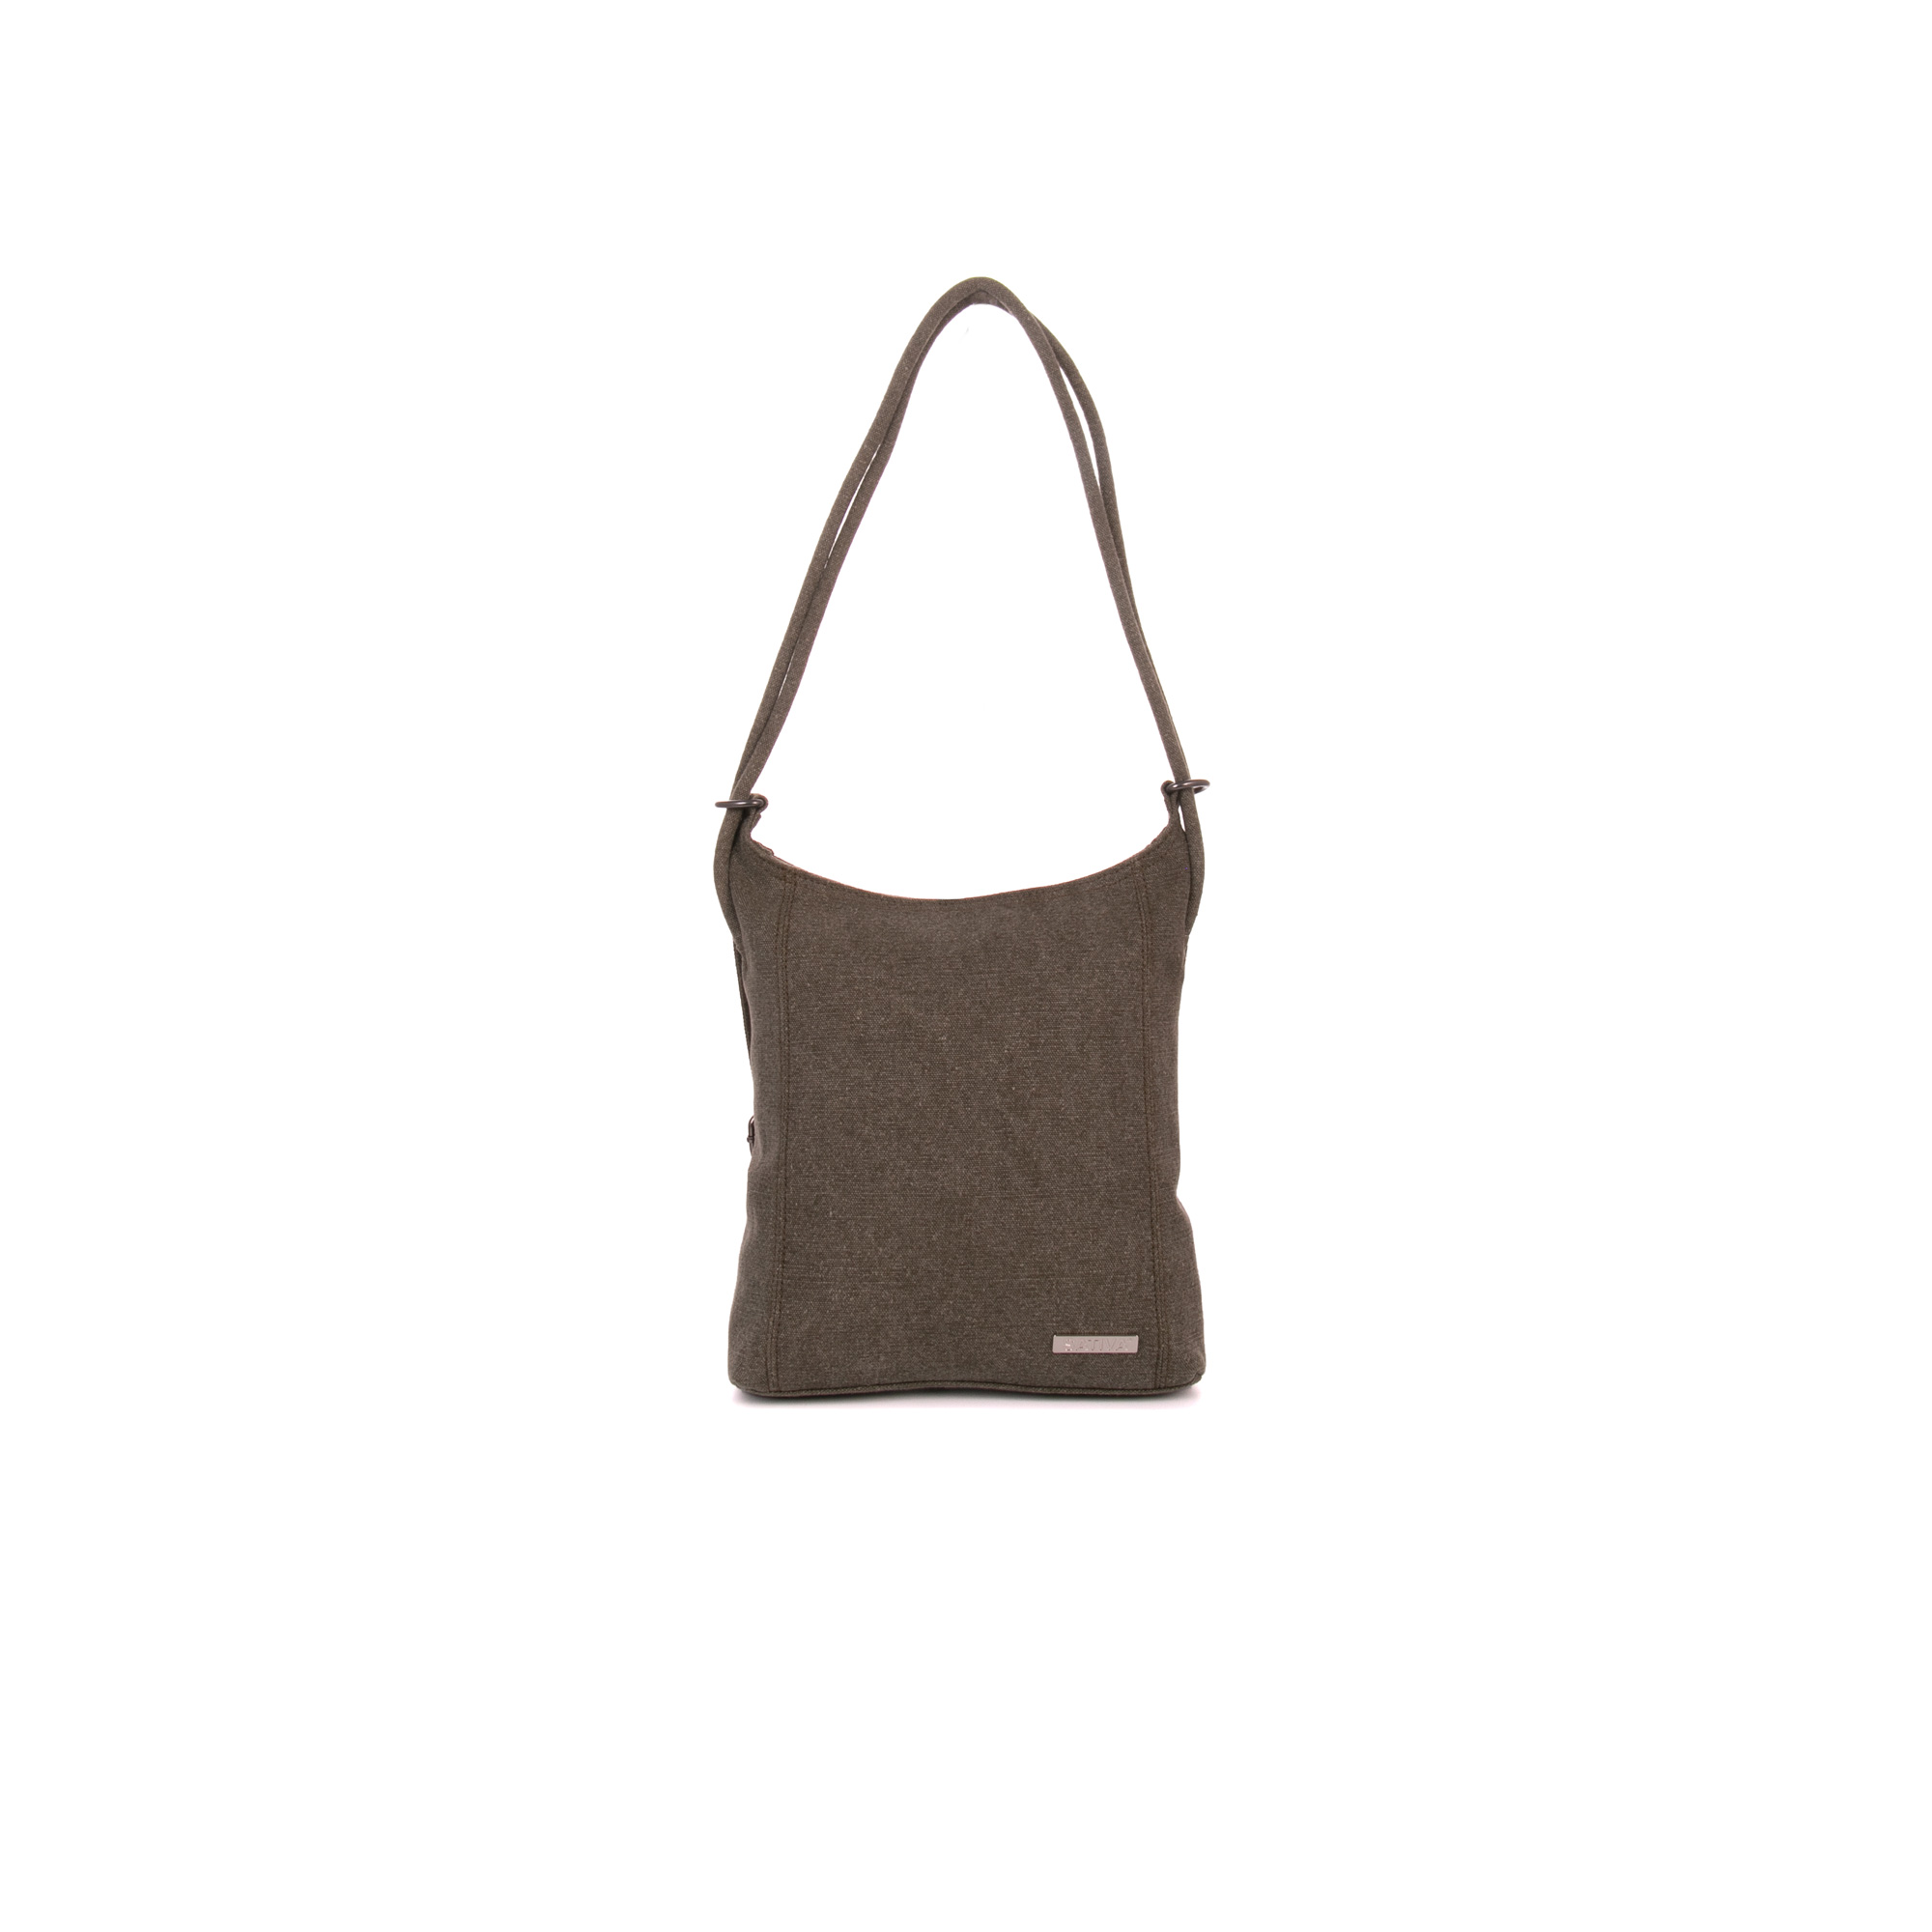 a913a351e85b Sativa Hemp Small Handbag   Backpack - Official Sativa® Hemp Bags